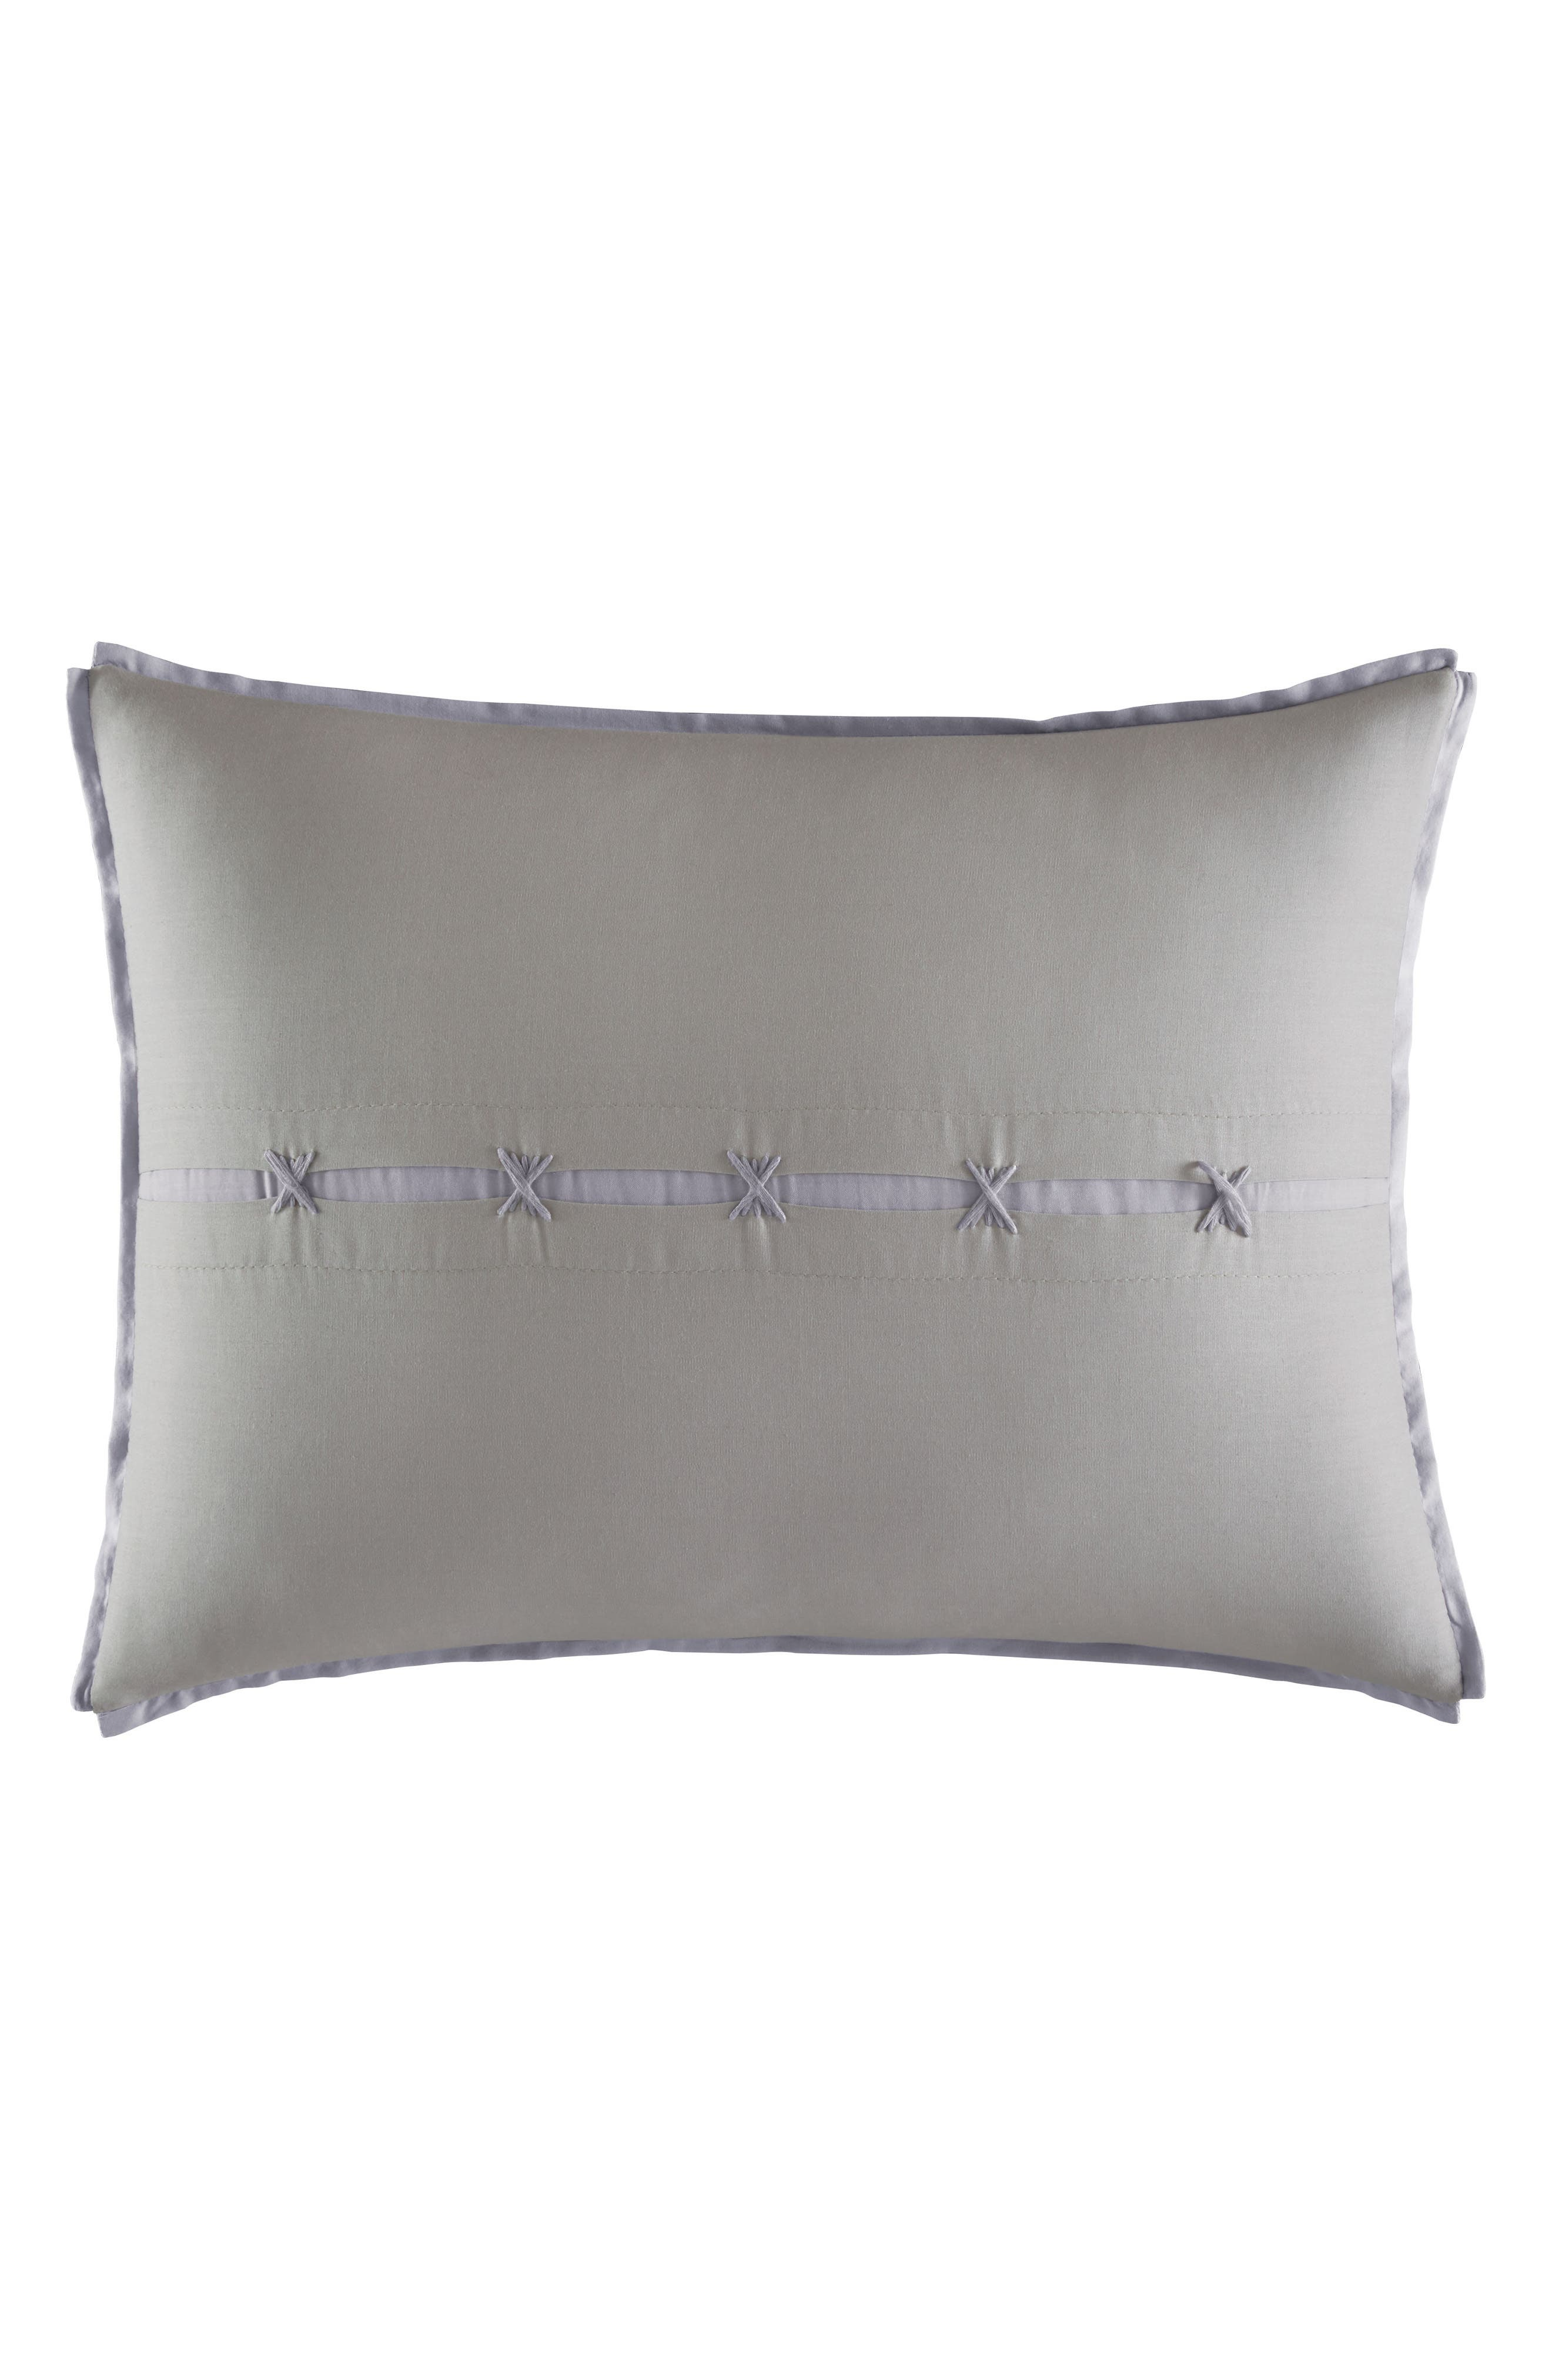 Transparent Leaves Accent Pillow,                             Main thumbnail 1, color,                             Medium Gray